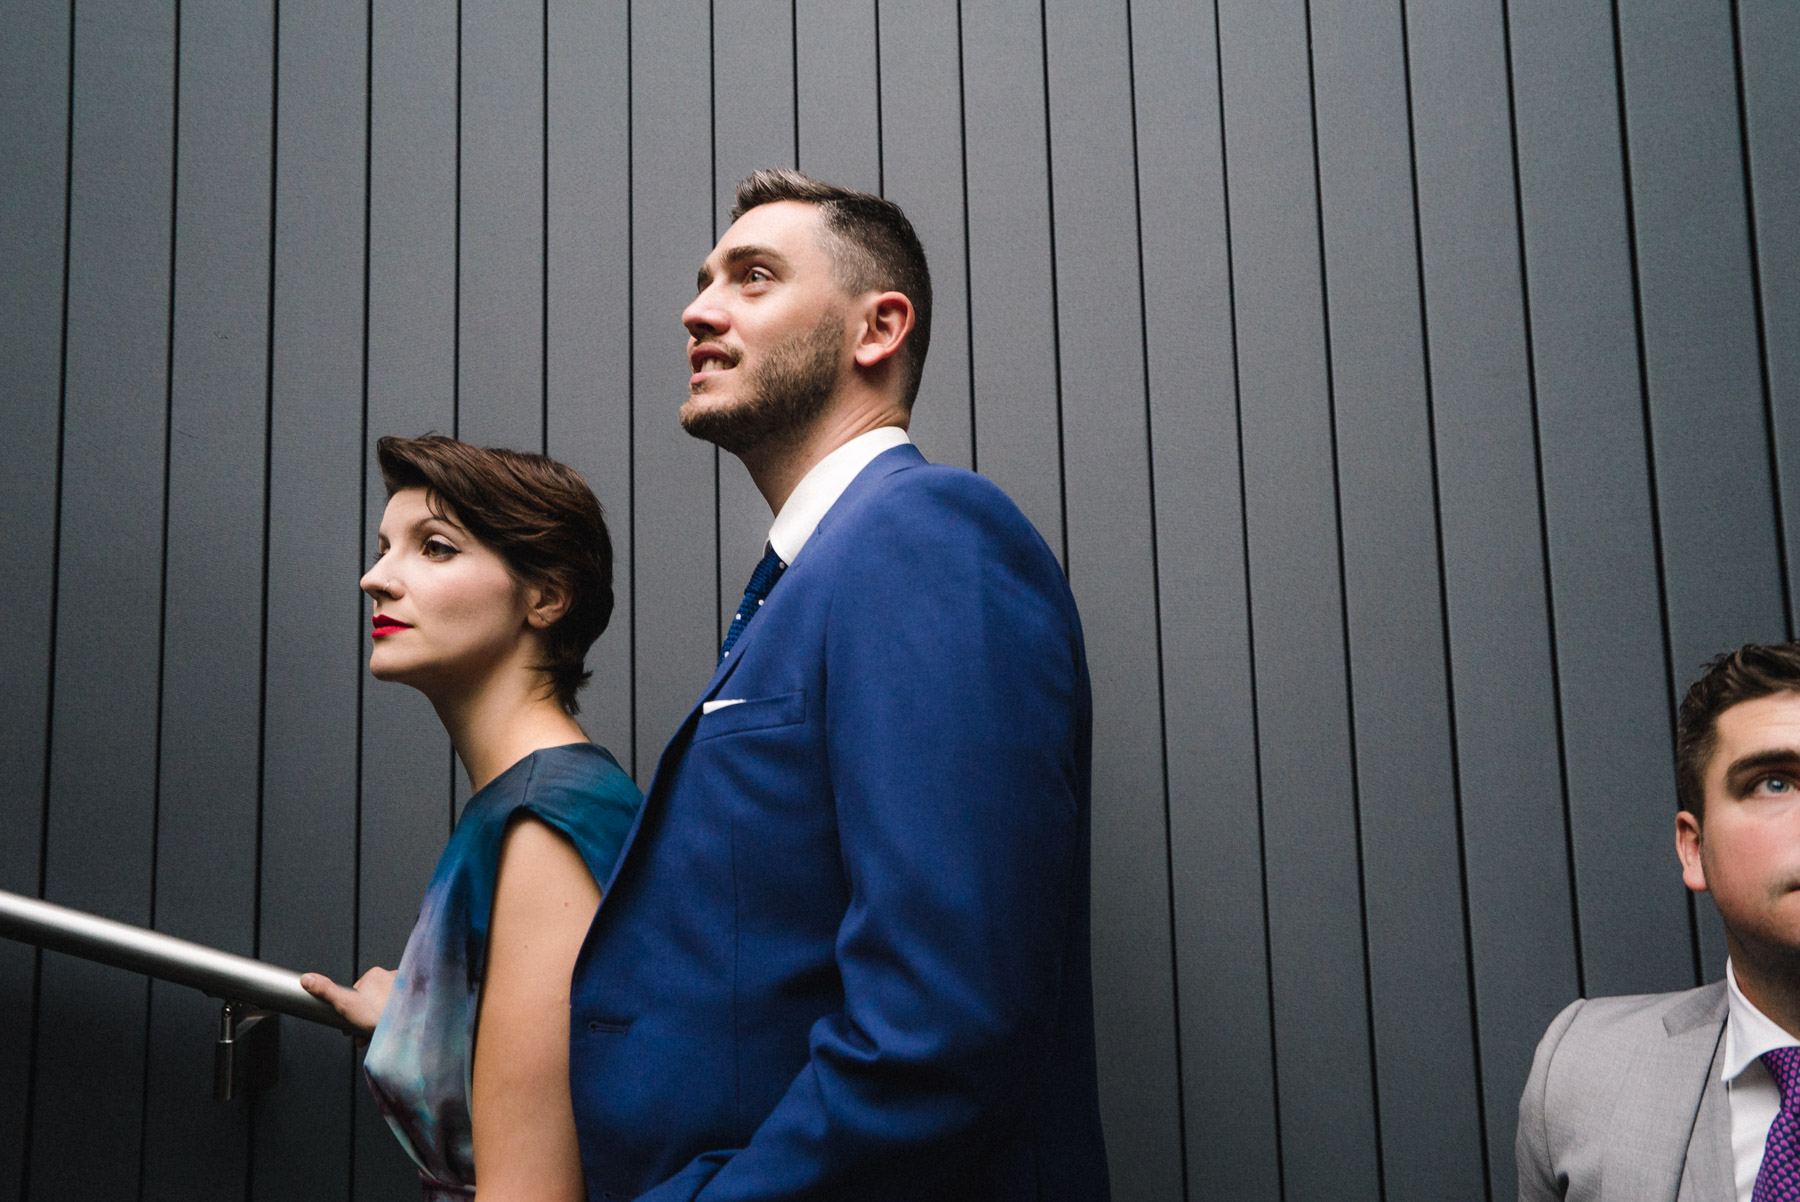 a portrait of wedding guests